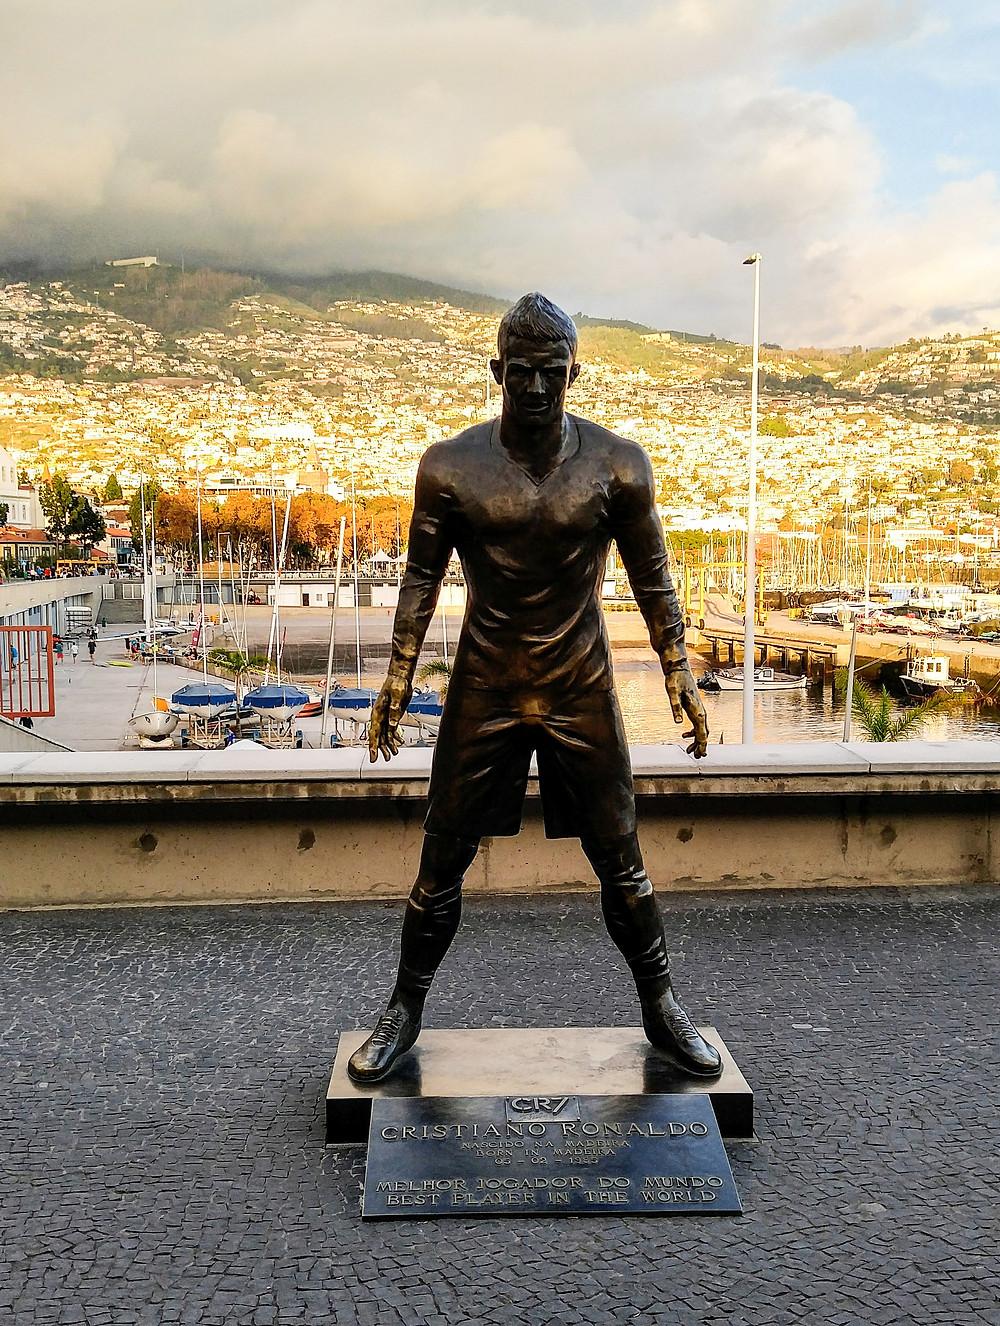 Cristiano Ronaldo, Funchal, Madeiraa